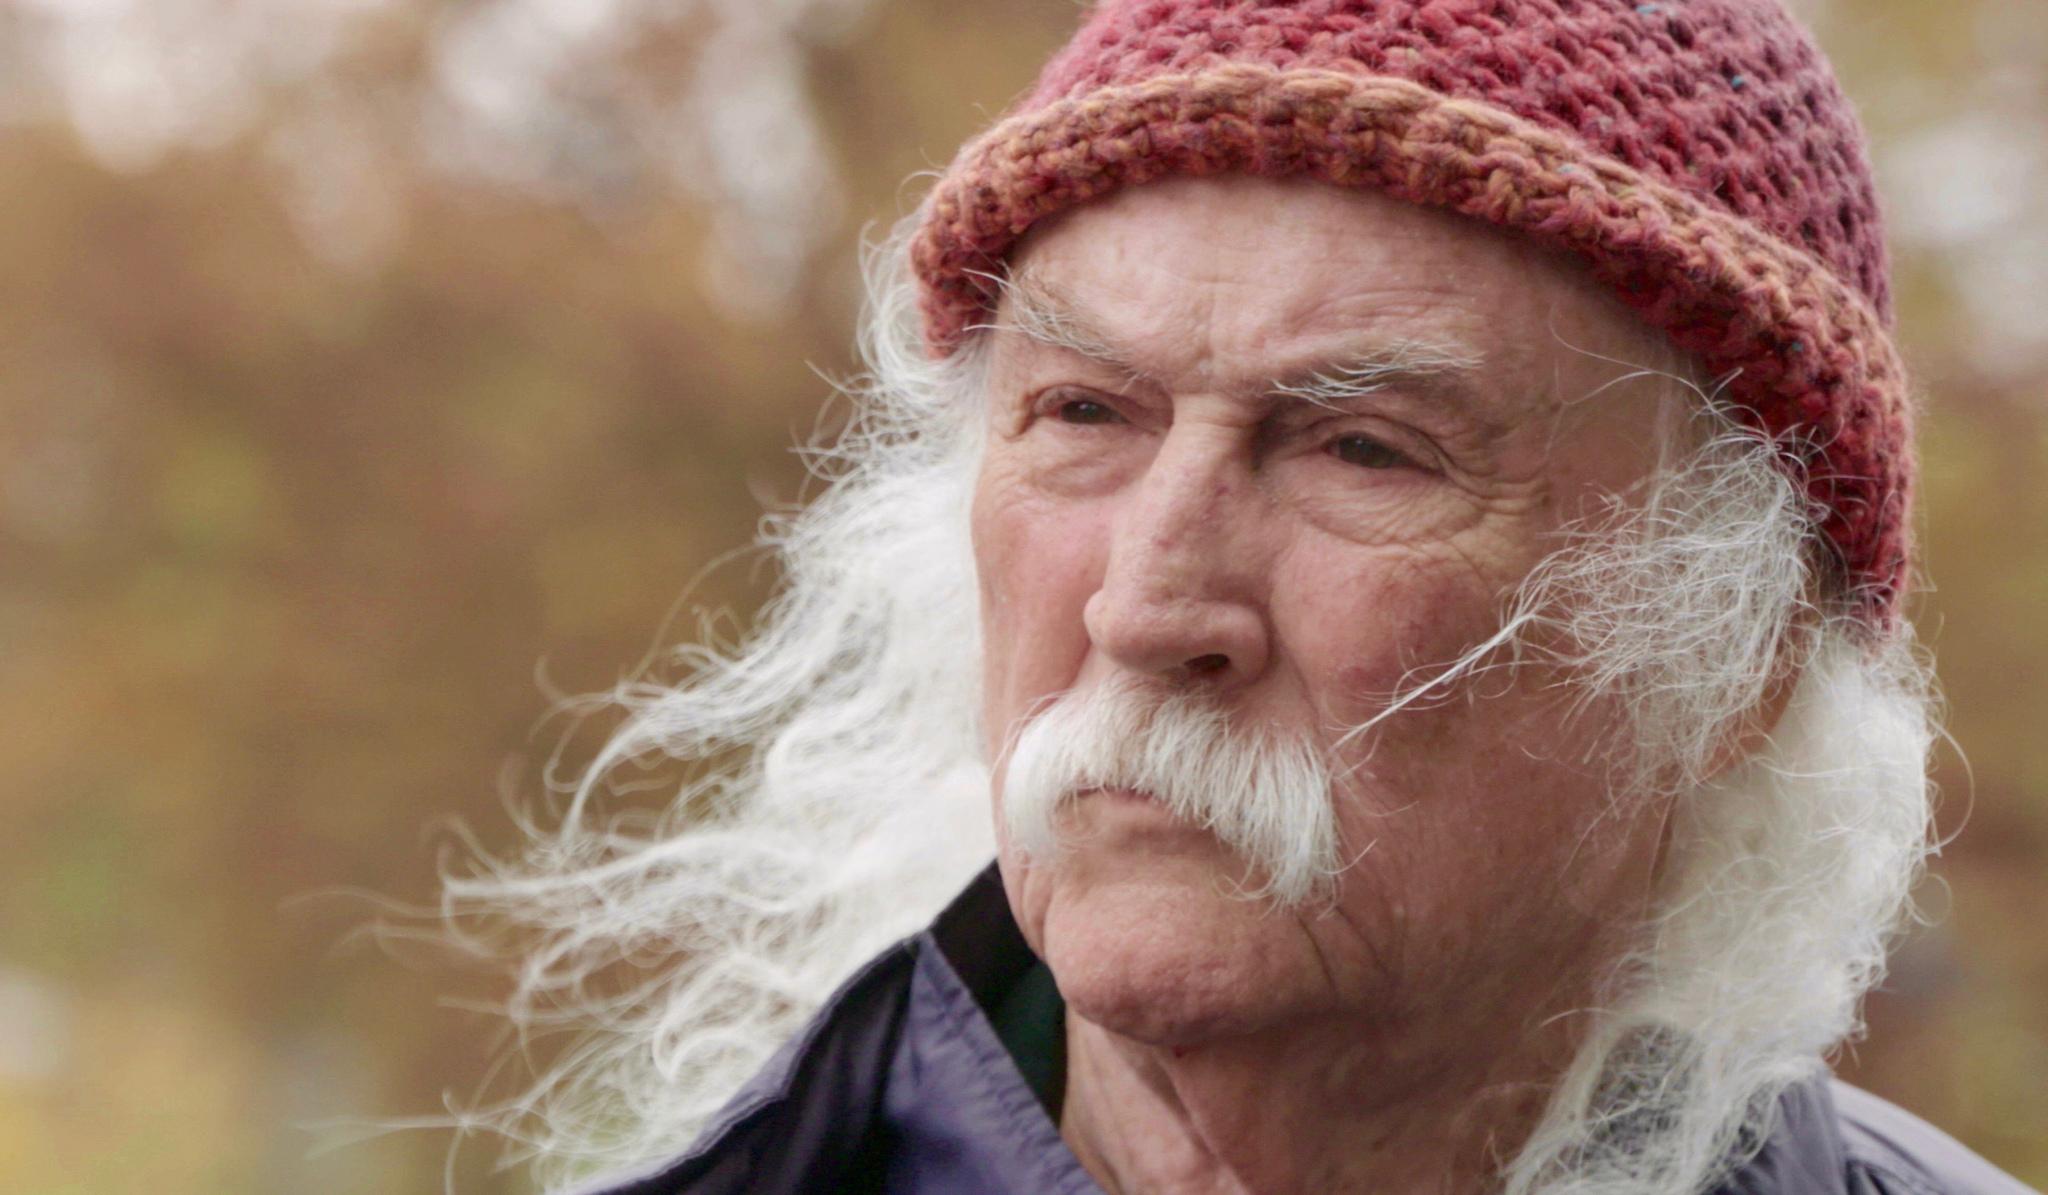 Sundance Film Festival 2019 Announced Over 100 Films Set to Screen in Park City